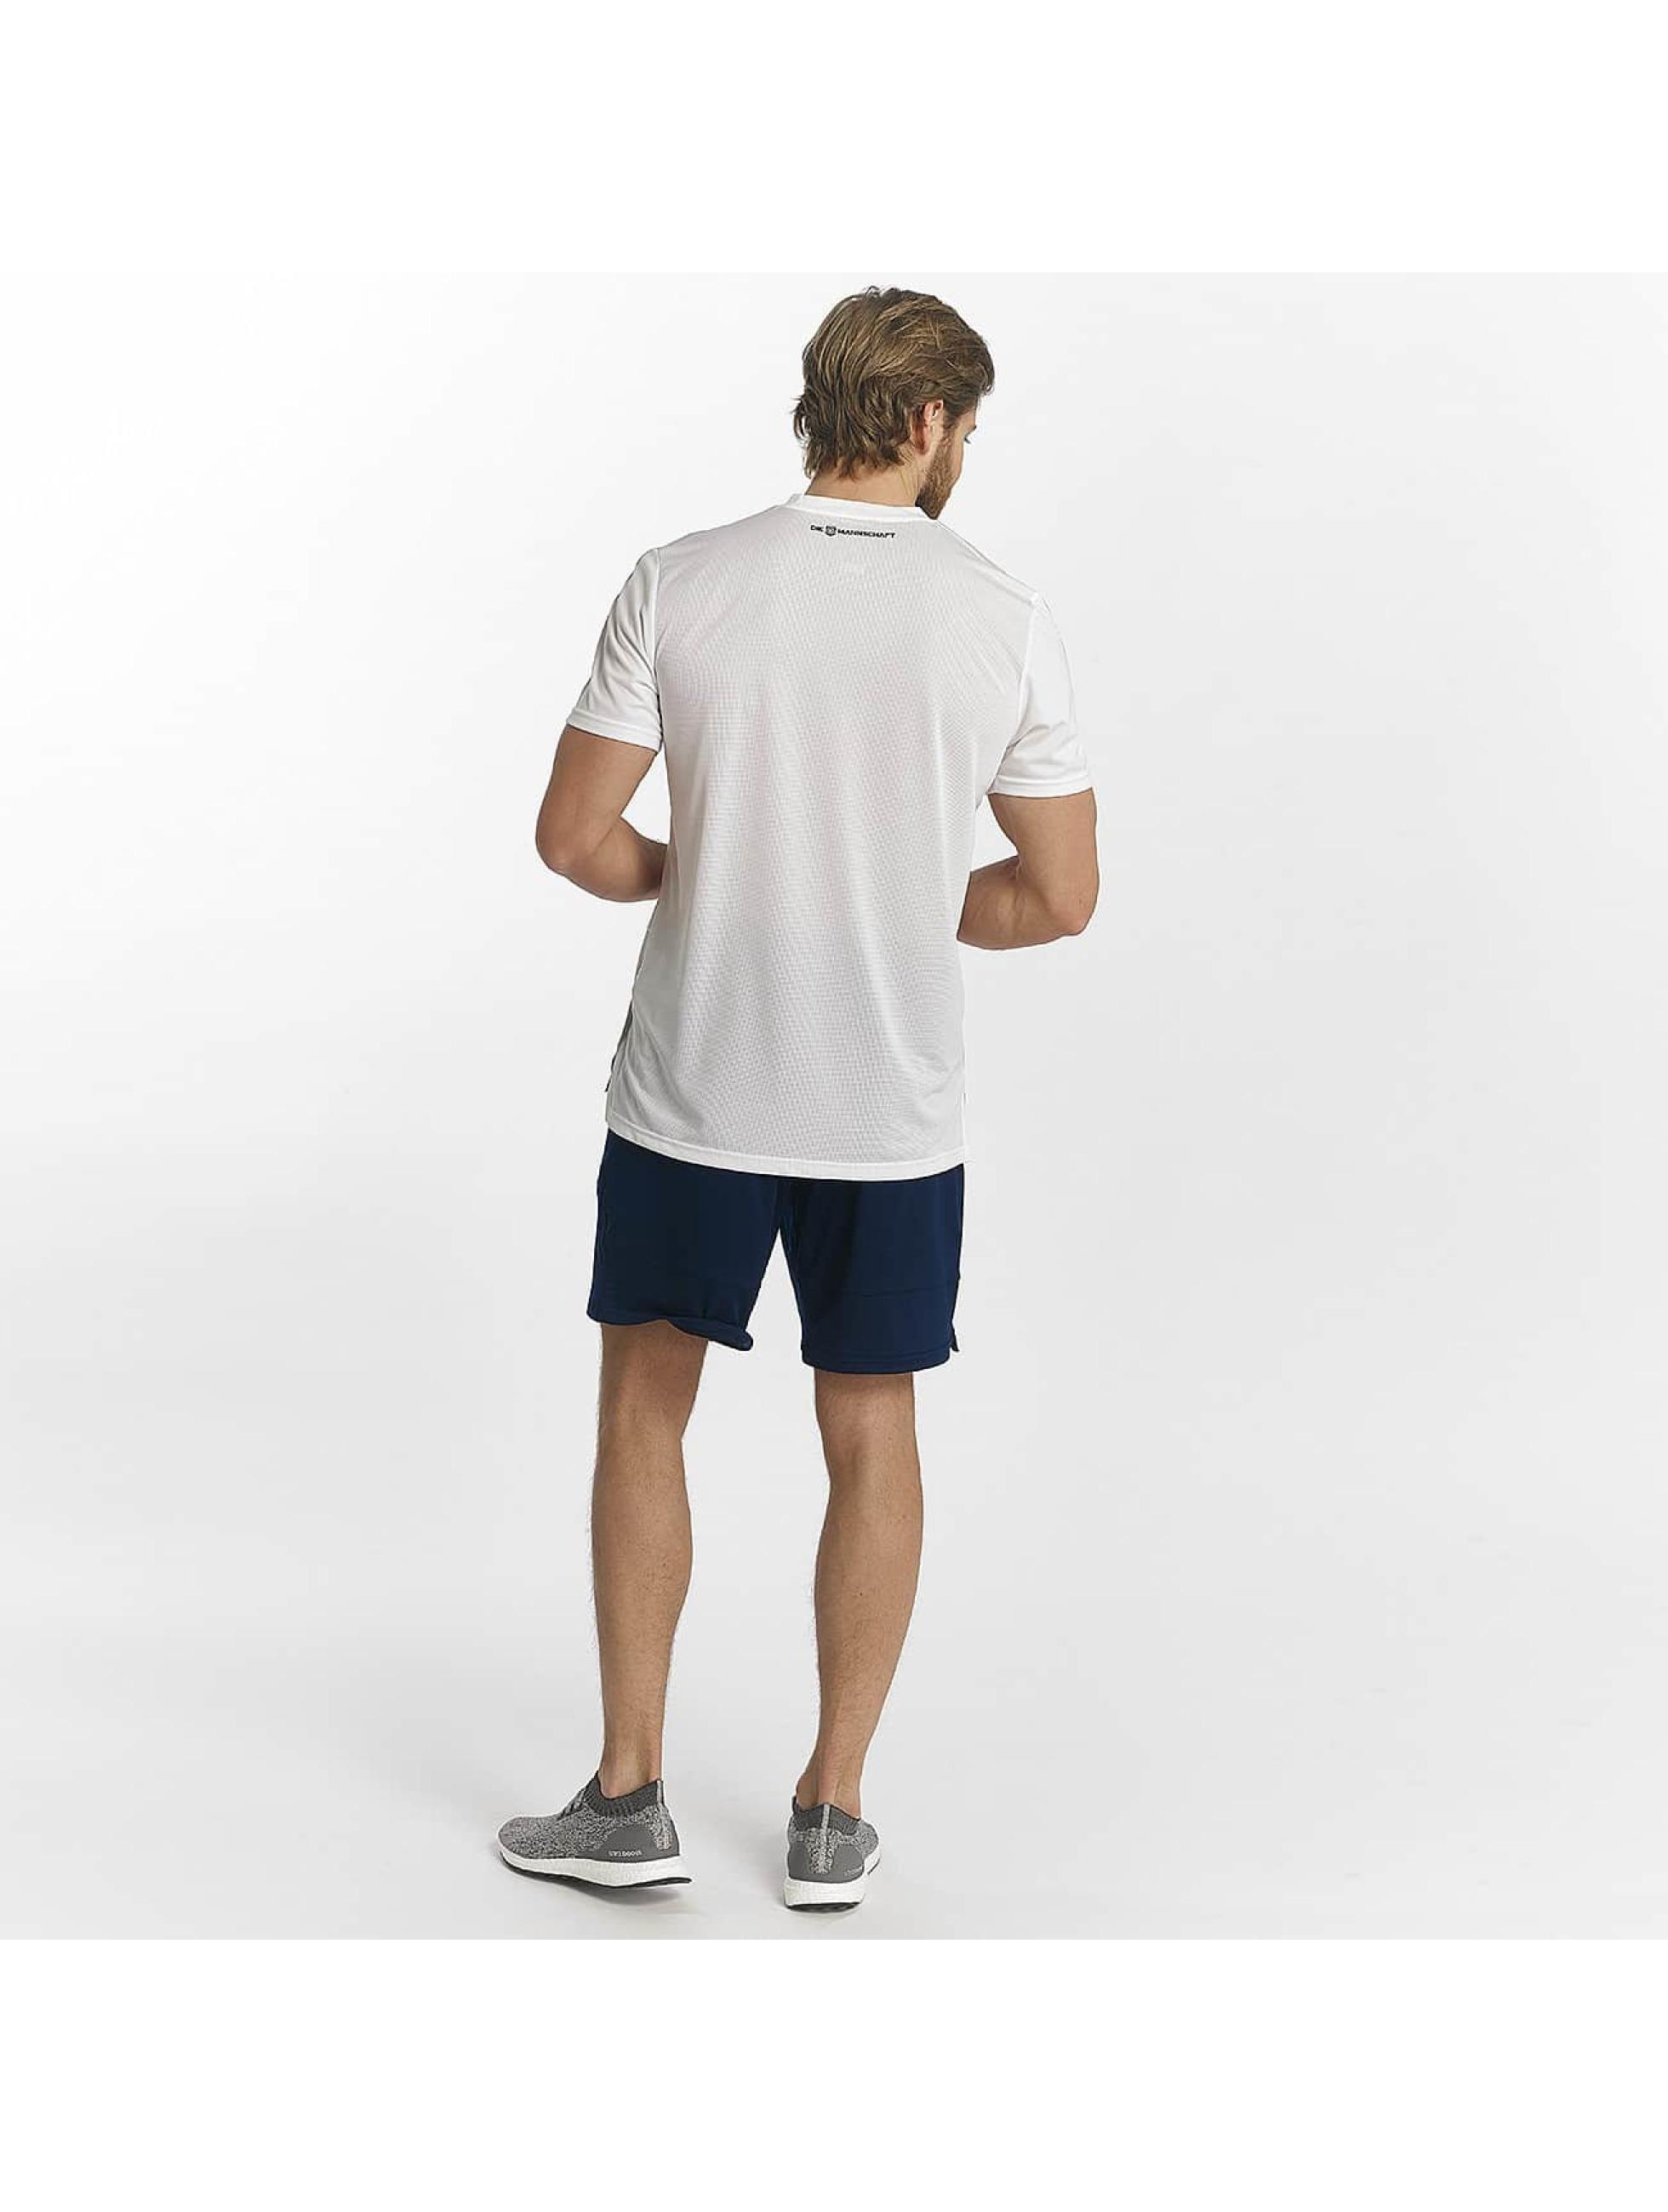 adidas Performance Trikot DFB Training weiß